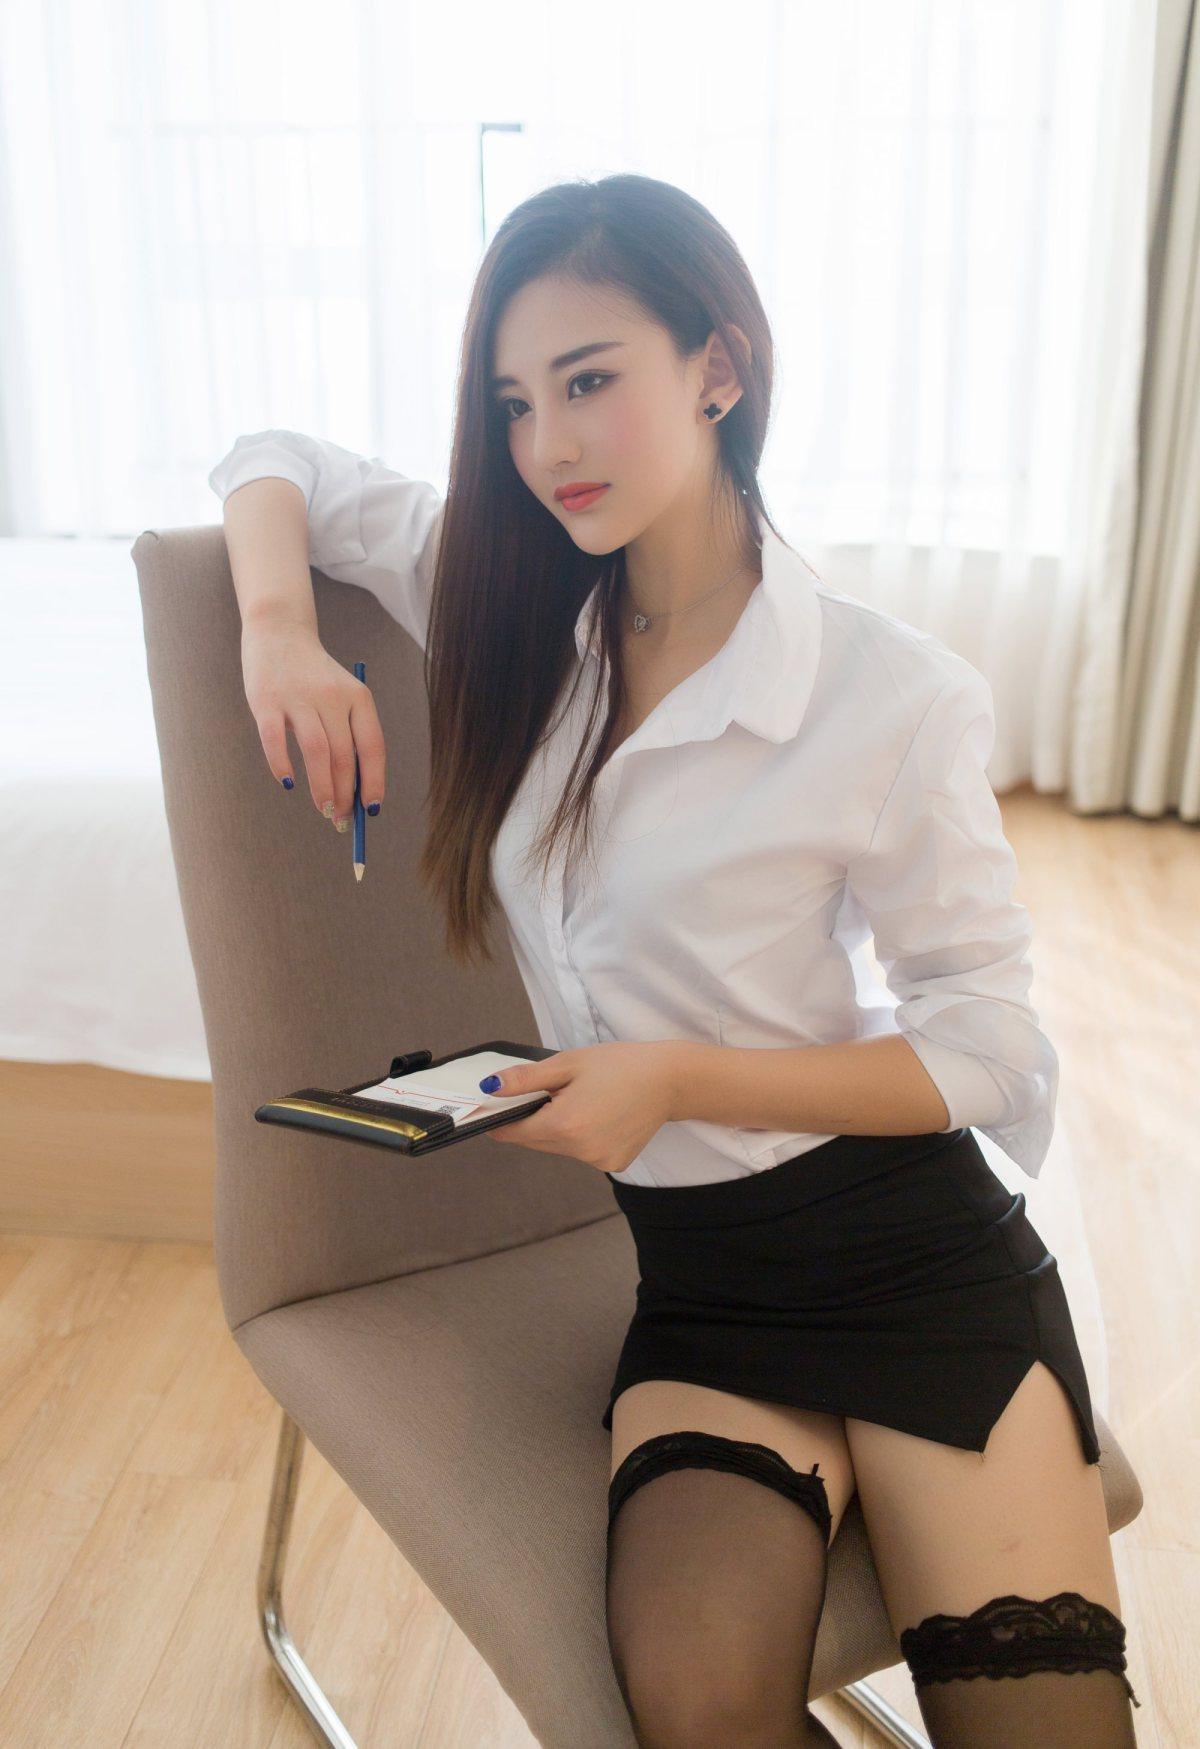 ABP-697情趣内衣长腿美女居家私房照